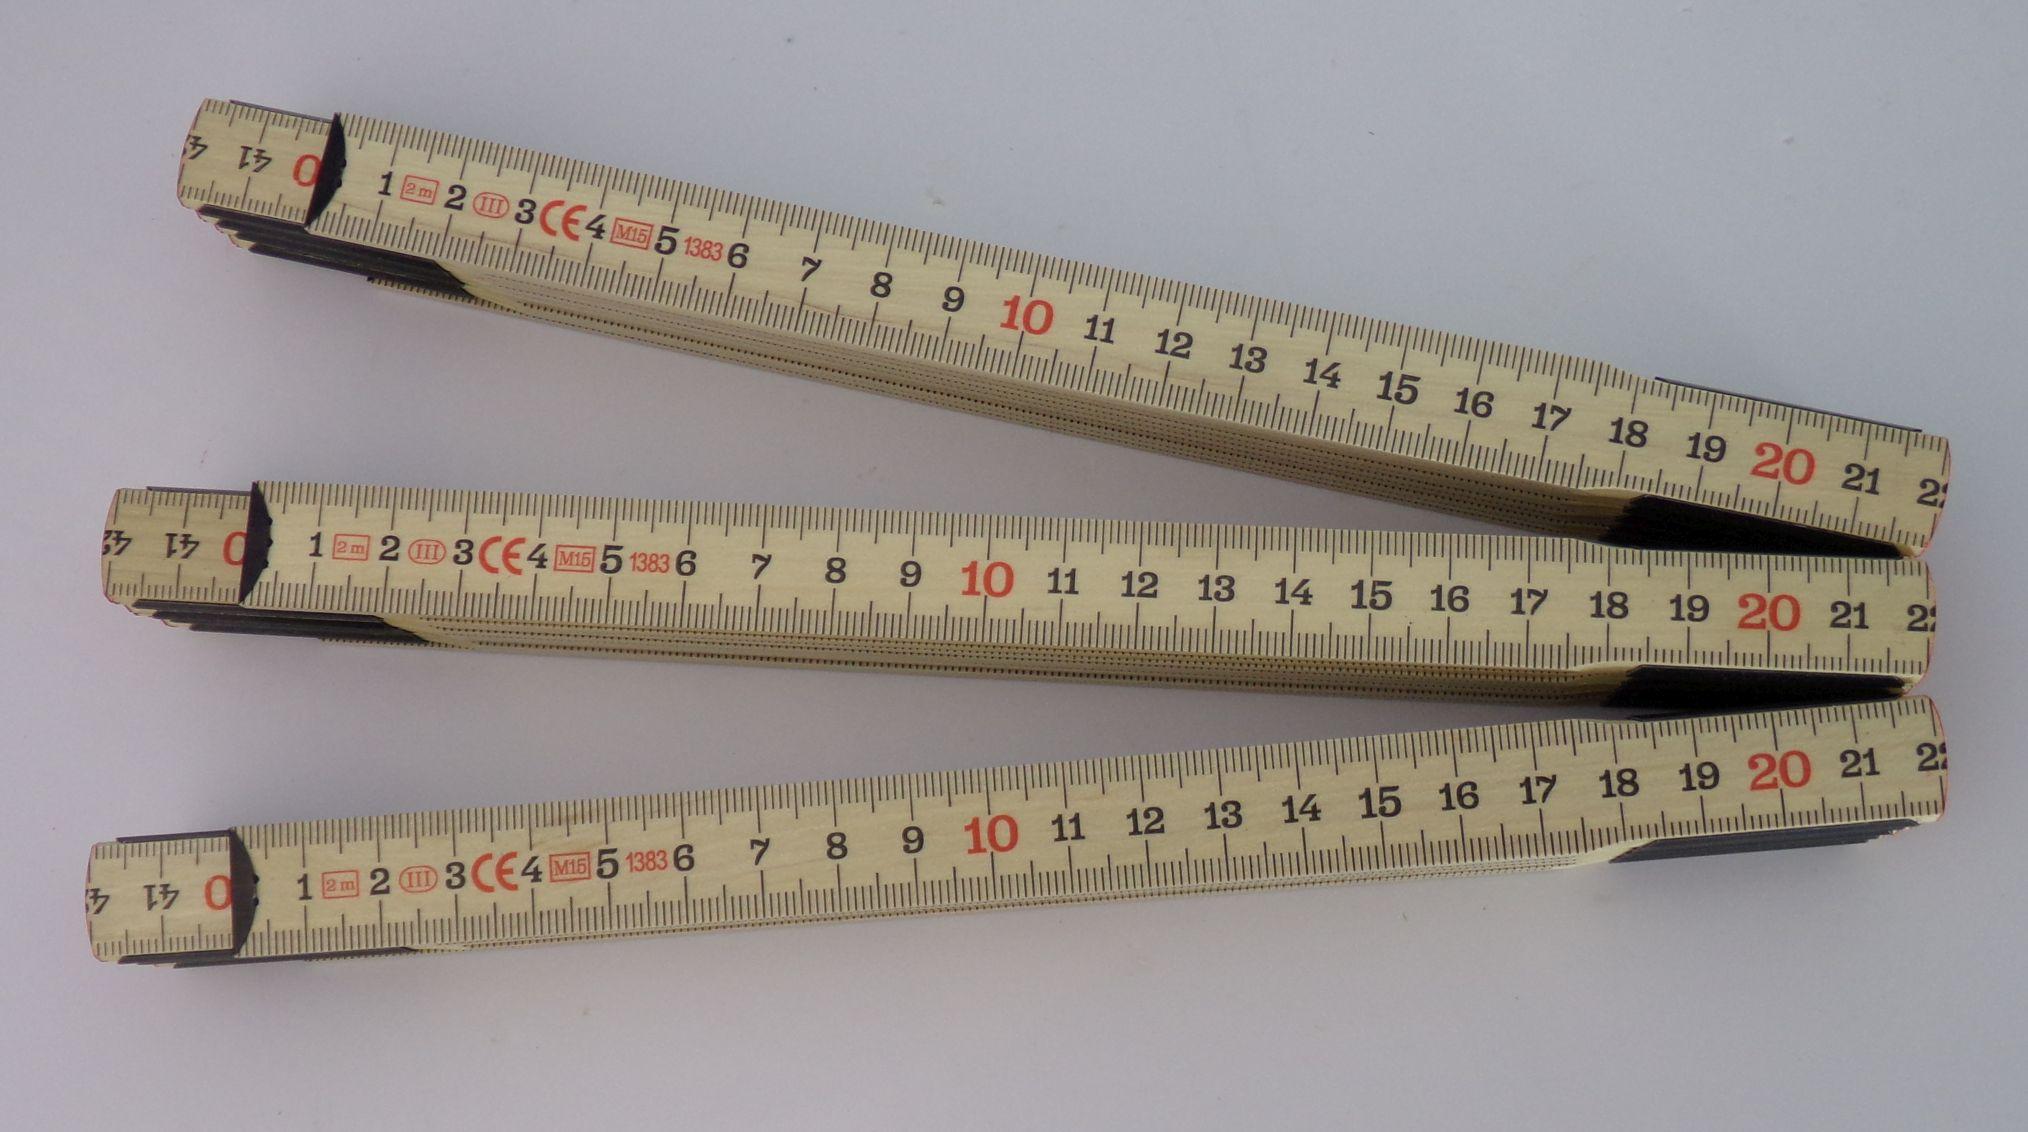 TRW CERAMIC resistors 500 ohm 5/% 10W model 7948 50 count